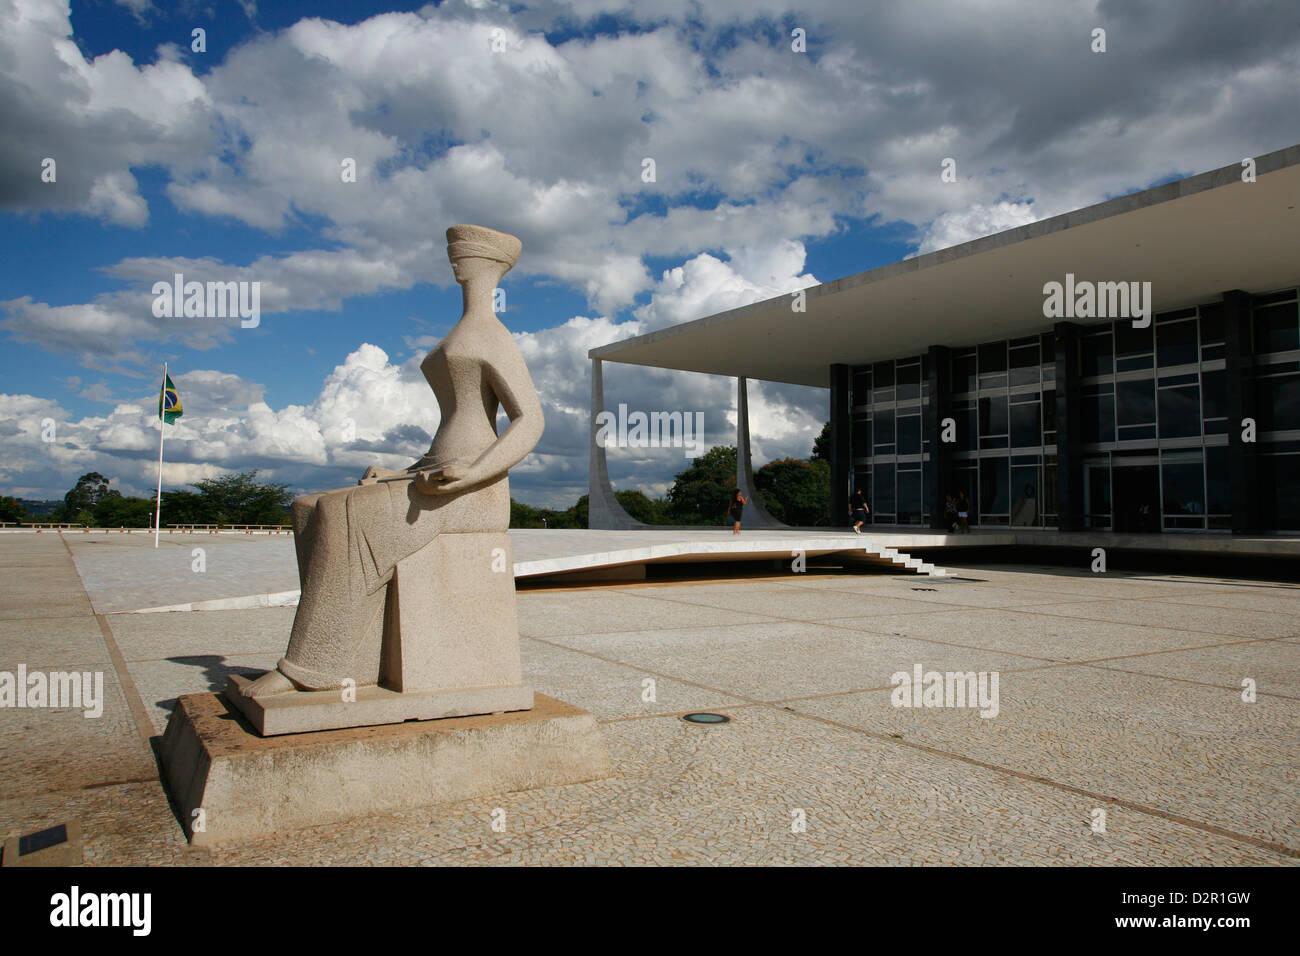 Justiz-Skulptur vor dem Supremo Tribunal Federal (oberste Eidgenössische Tribuna), Brasilia, Brasilien Stockbild